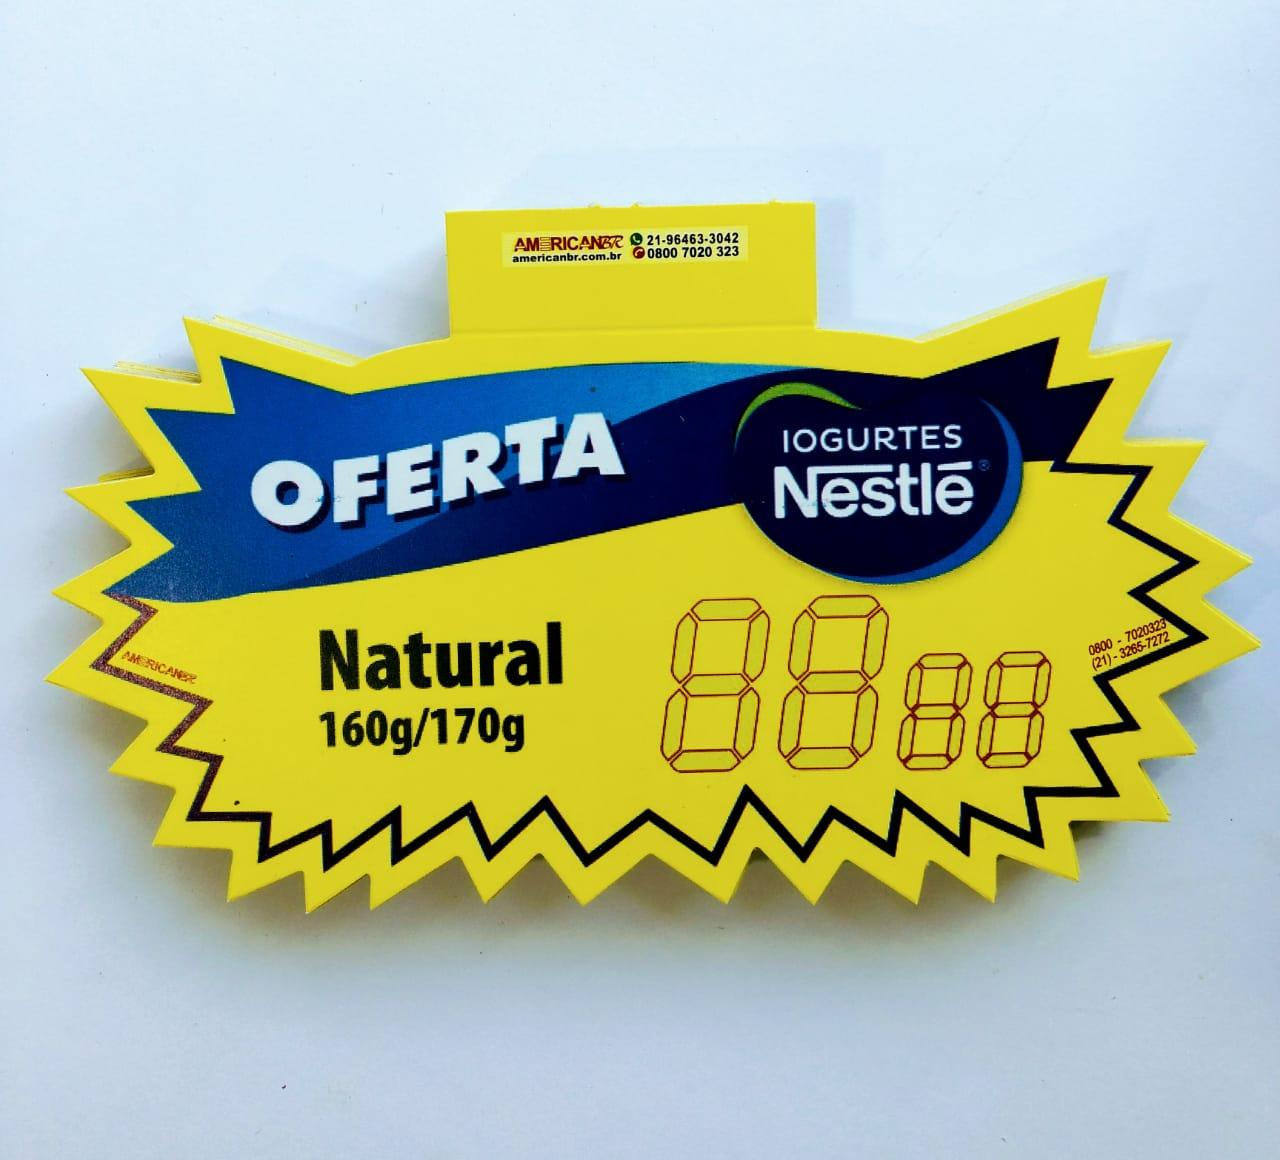 SPLASH OFERTA NESTLÉ IOGURTES NATURAL 12X20CM (C/50 UNIDADES)